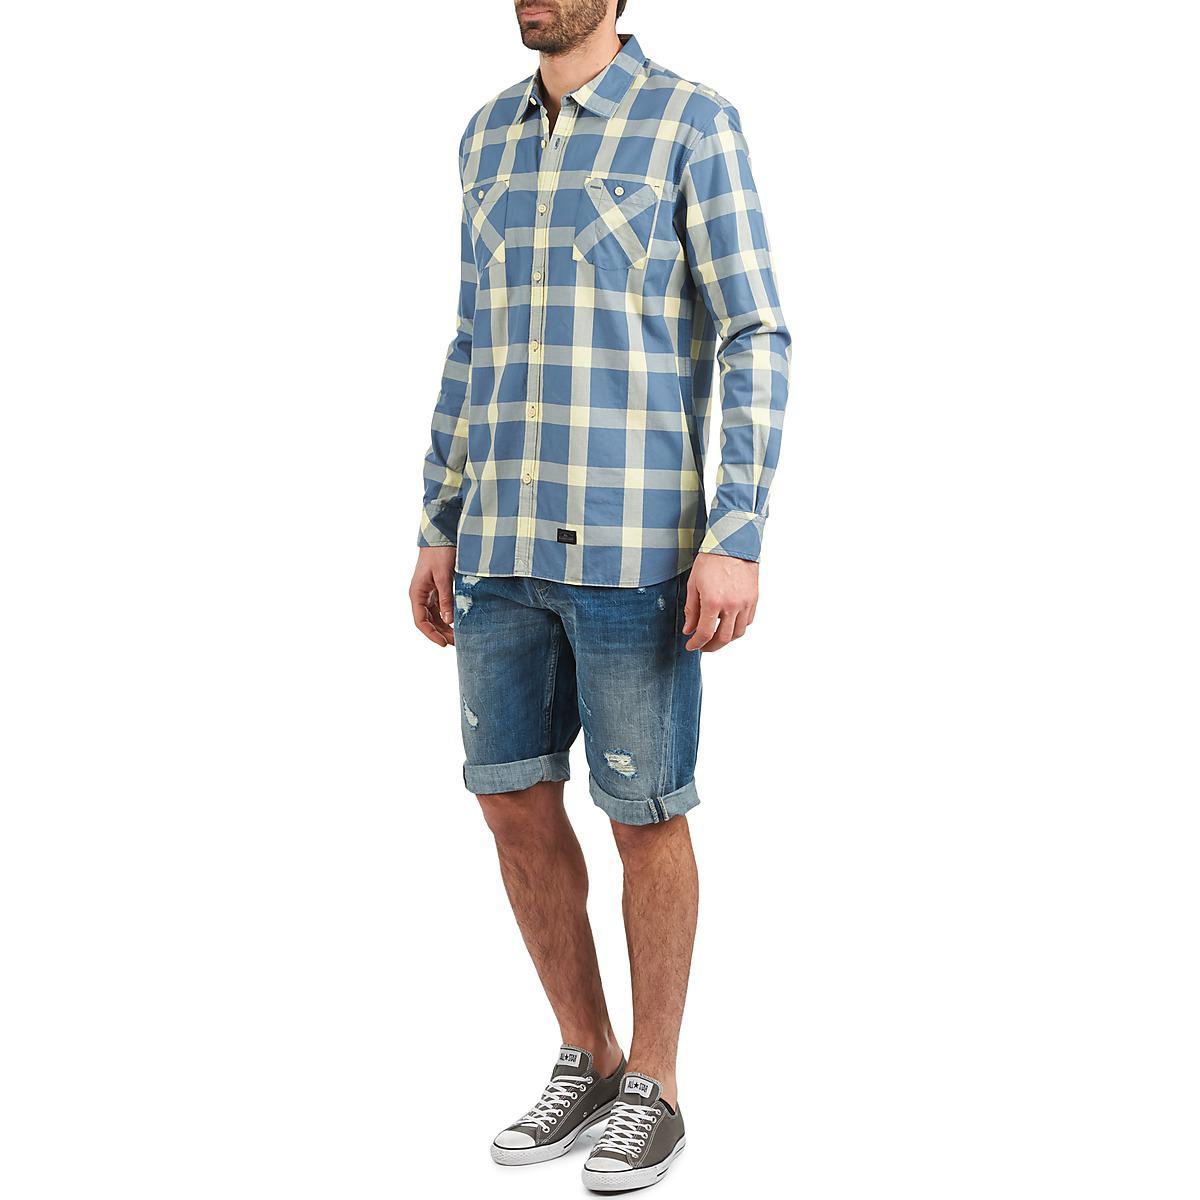 Quiksilver Denim Ramos Long Sleeved Shirt in Blue for Men